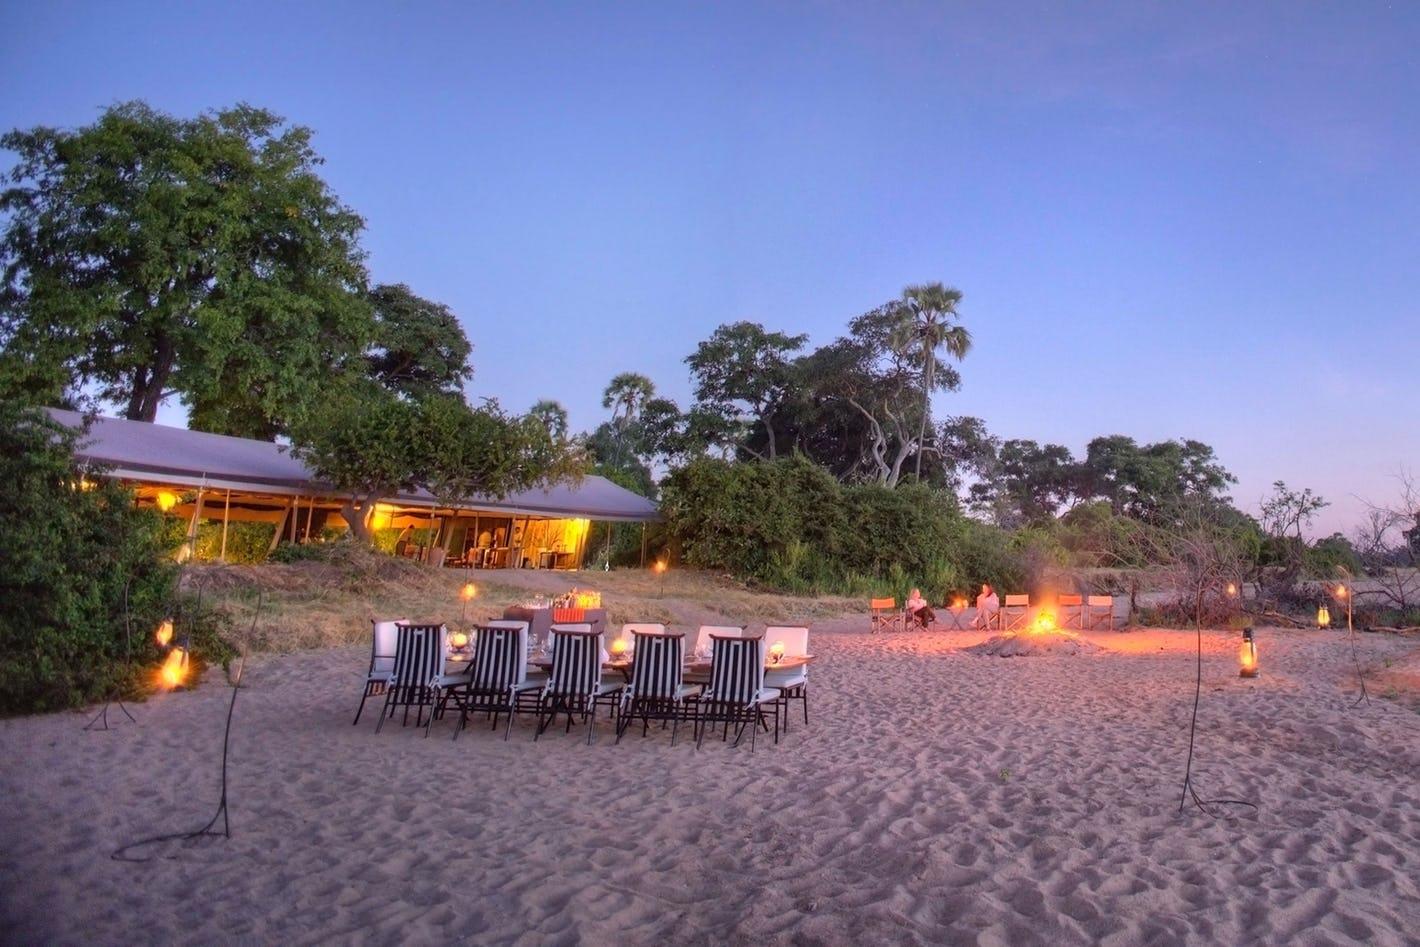 Plan an affordable Tanzania safari